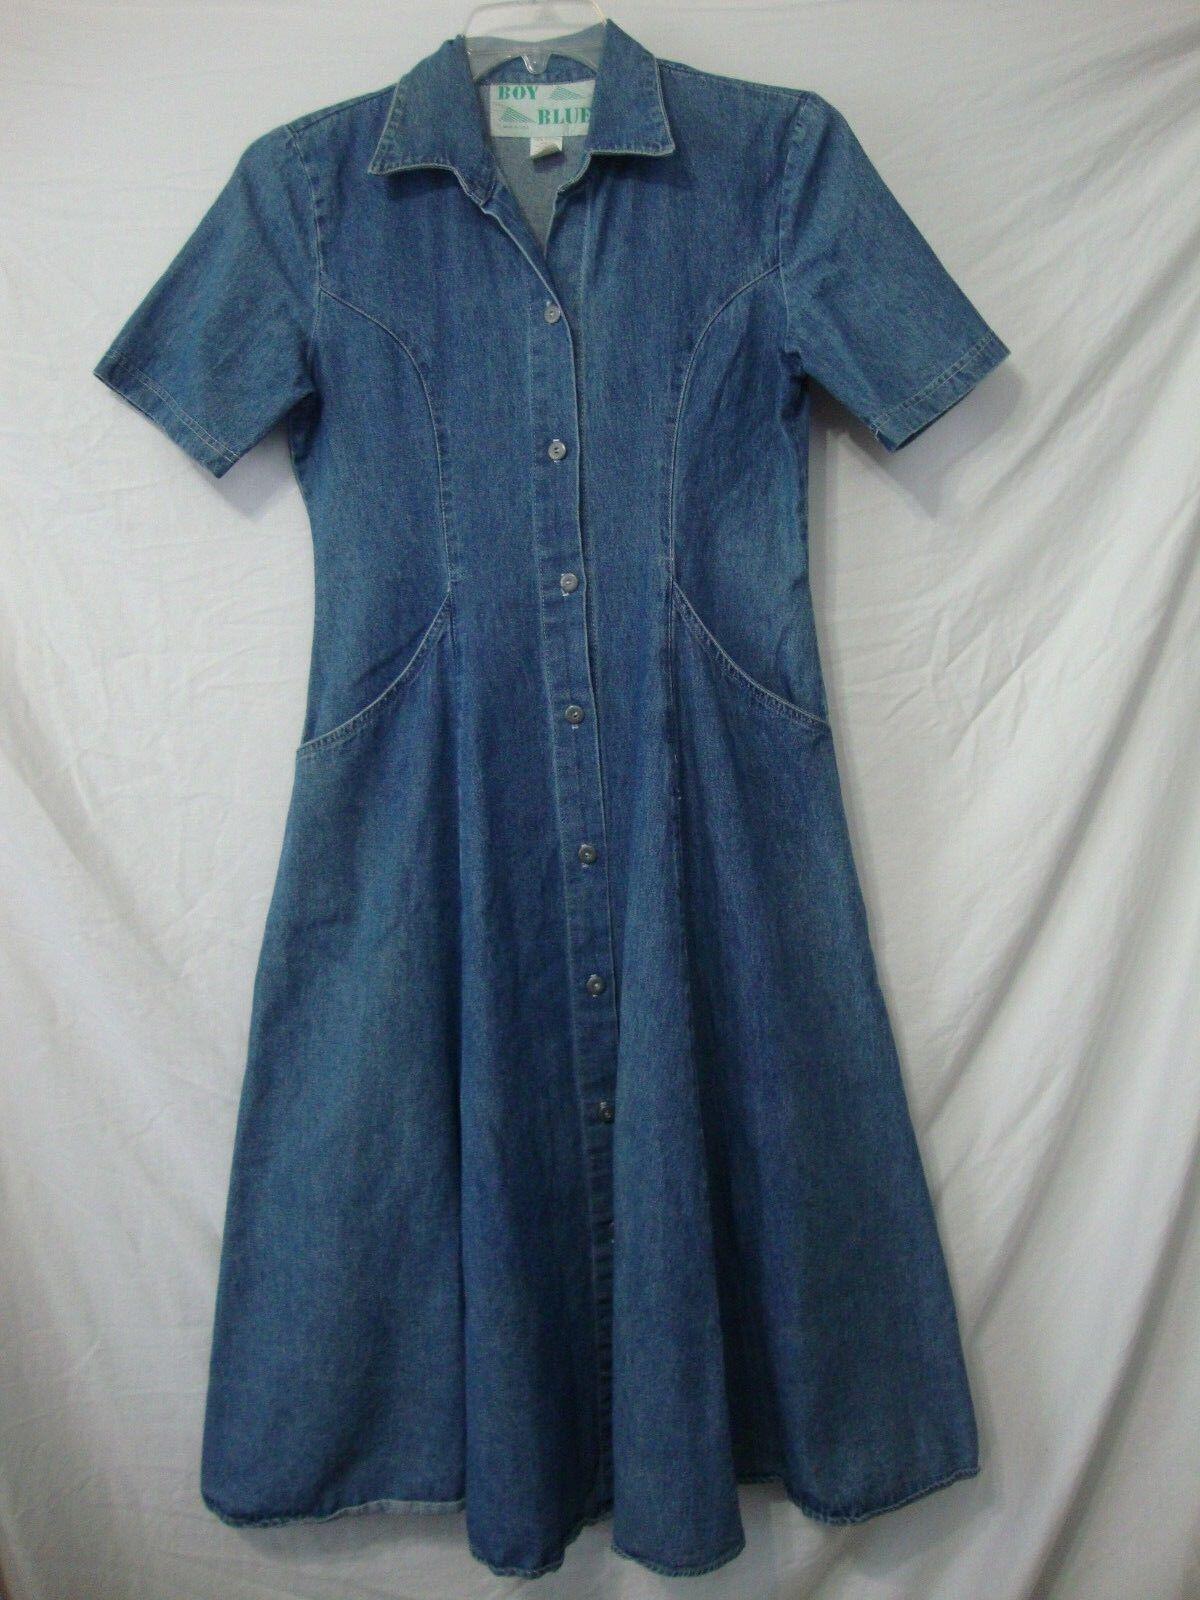 Vtg 80s Boy bluee Denim Dress Small 100% Cotton Made USA Long Length Button Front